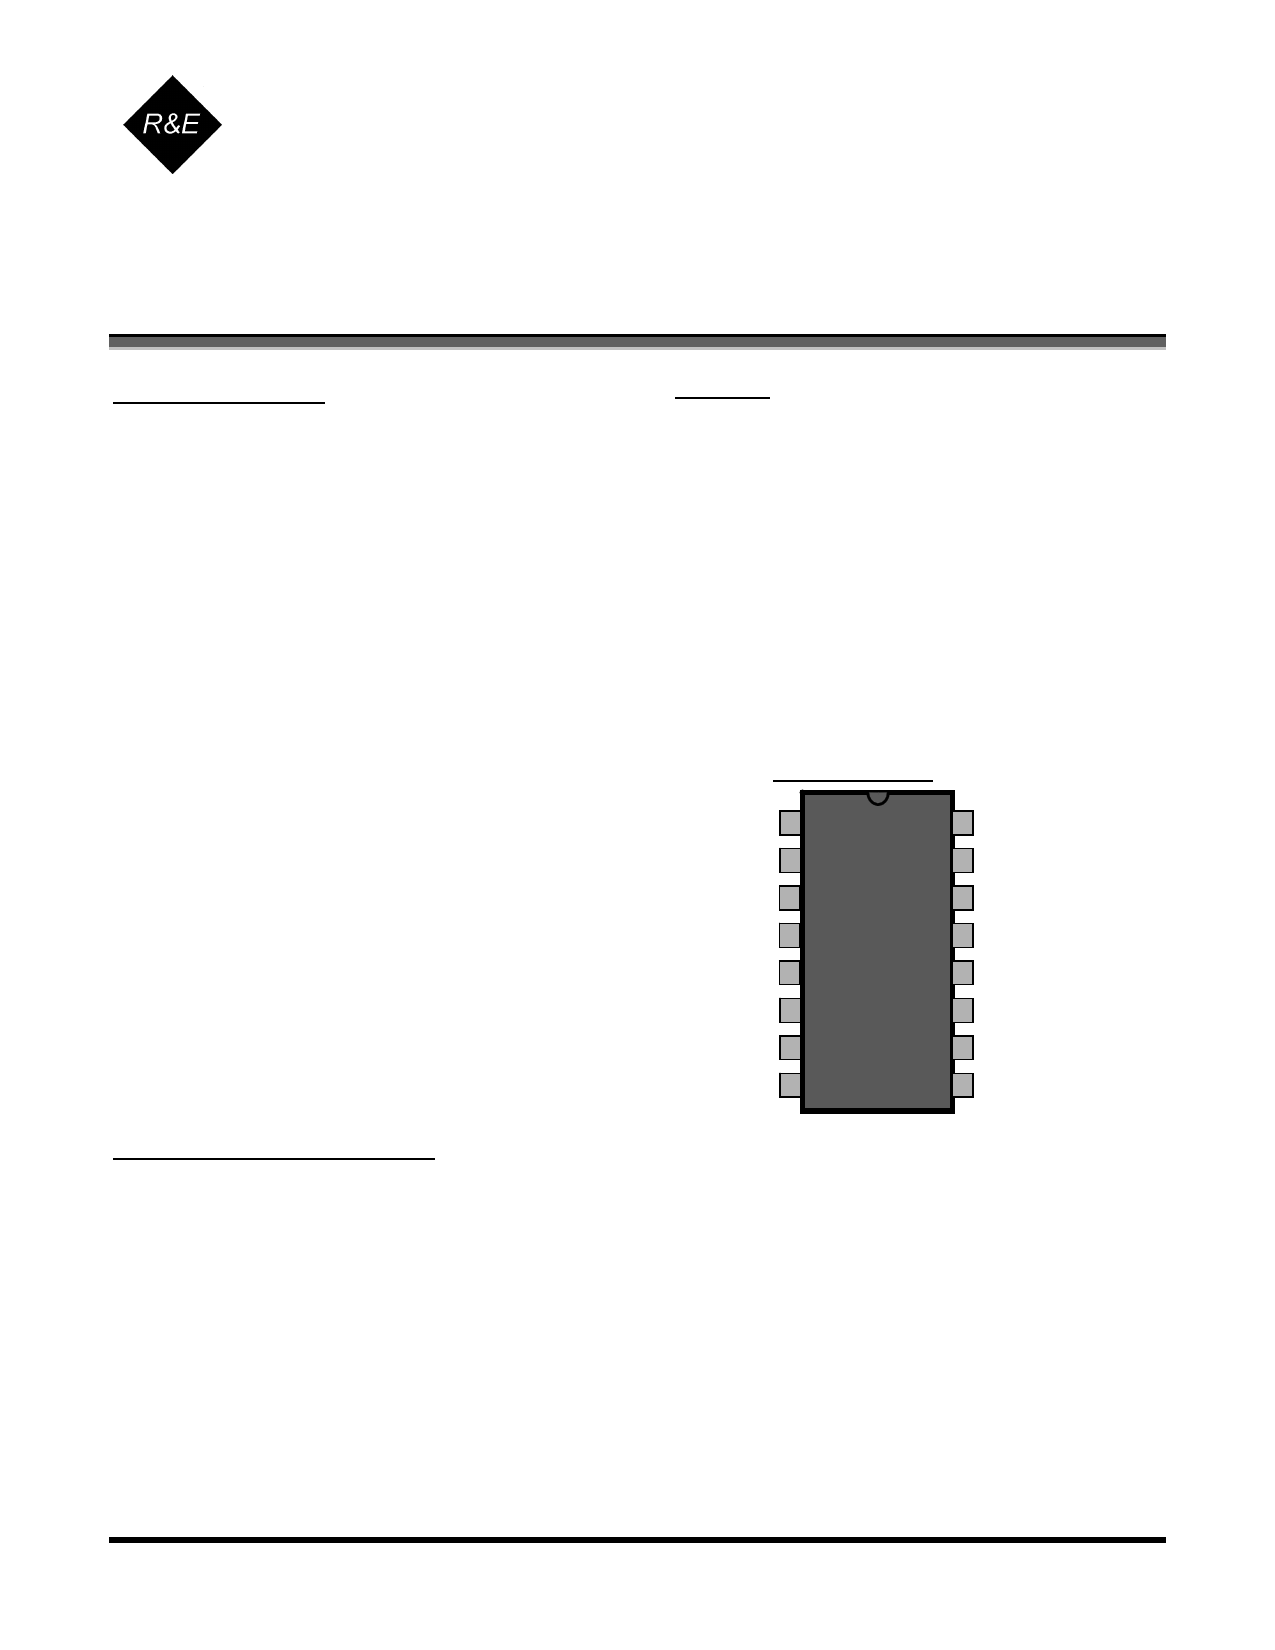 US5422629 likewise Sgc Module besides Fire Detection Smoke Detector Sensor Of 60058478020 furthermore RE46C122 Pdf also Protec 6000plushttsl Interactive Heat Sensor With Talking Sounder Led Beacon. on smoke detector sensitivity